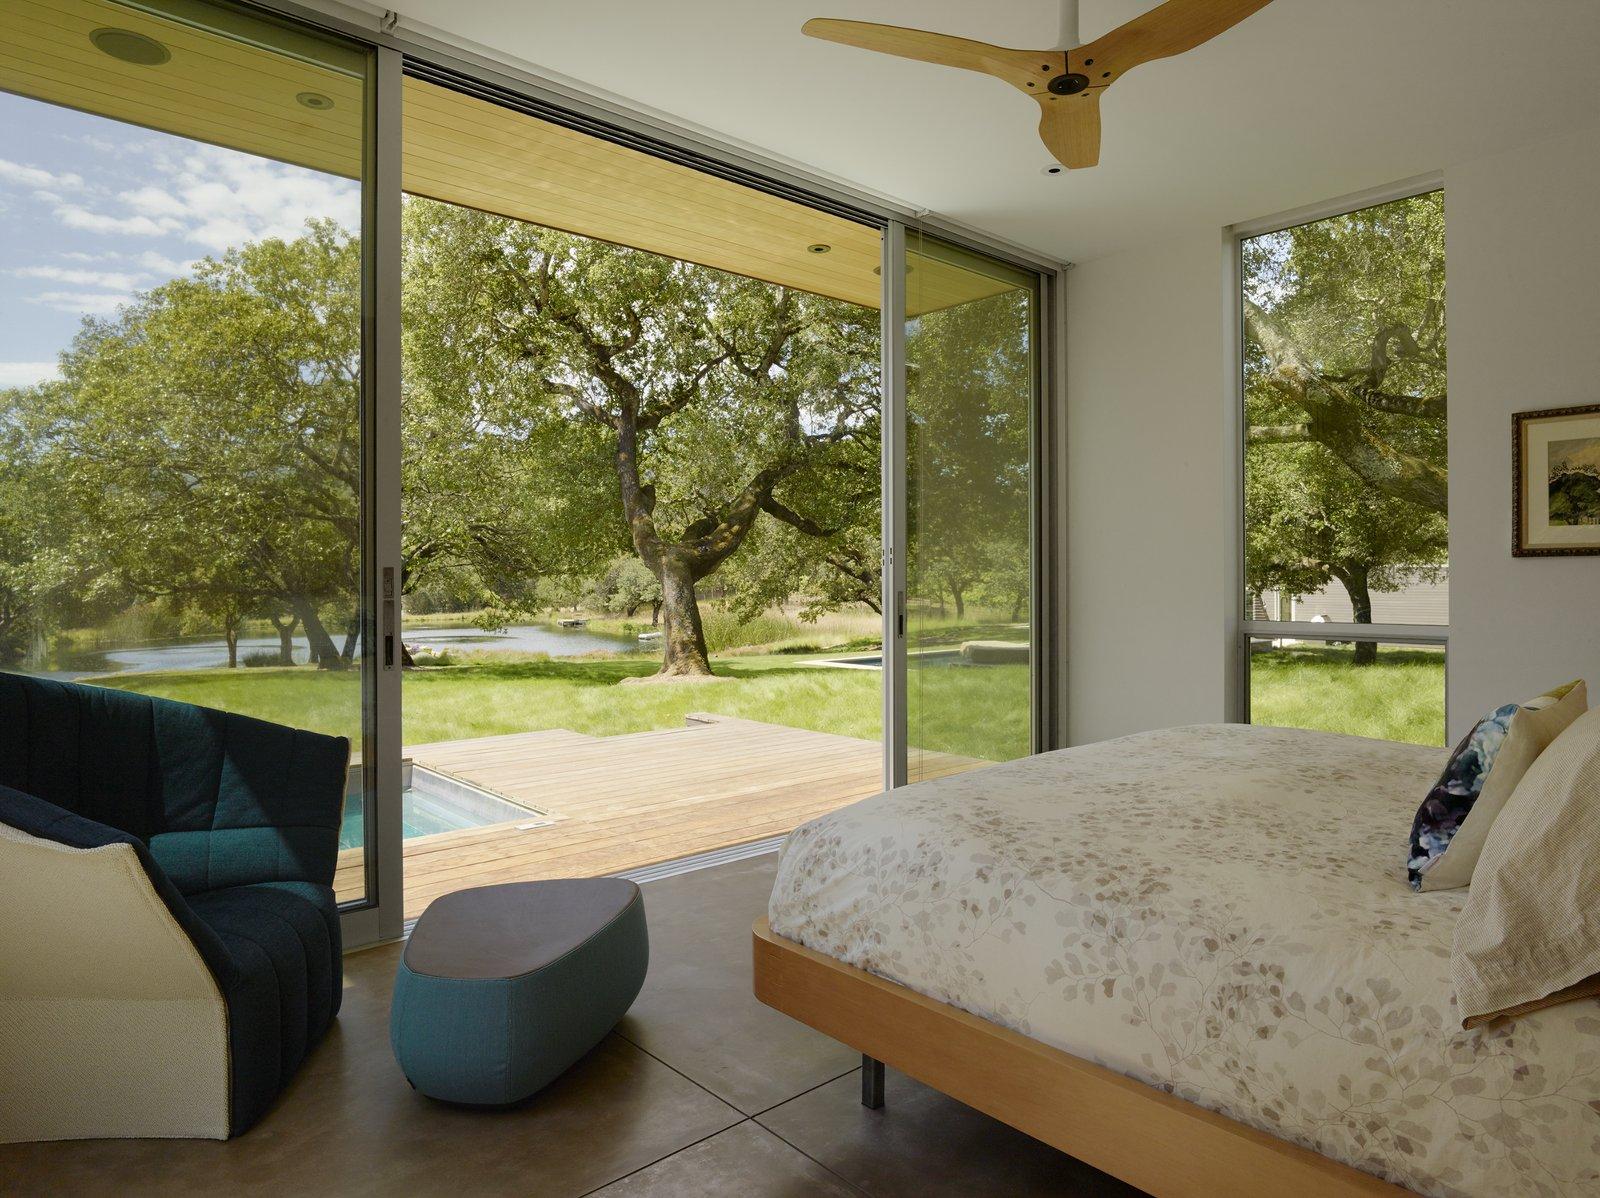 #TurnbullGriffinHaesloop #interior #bedroom #window #hottub